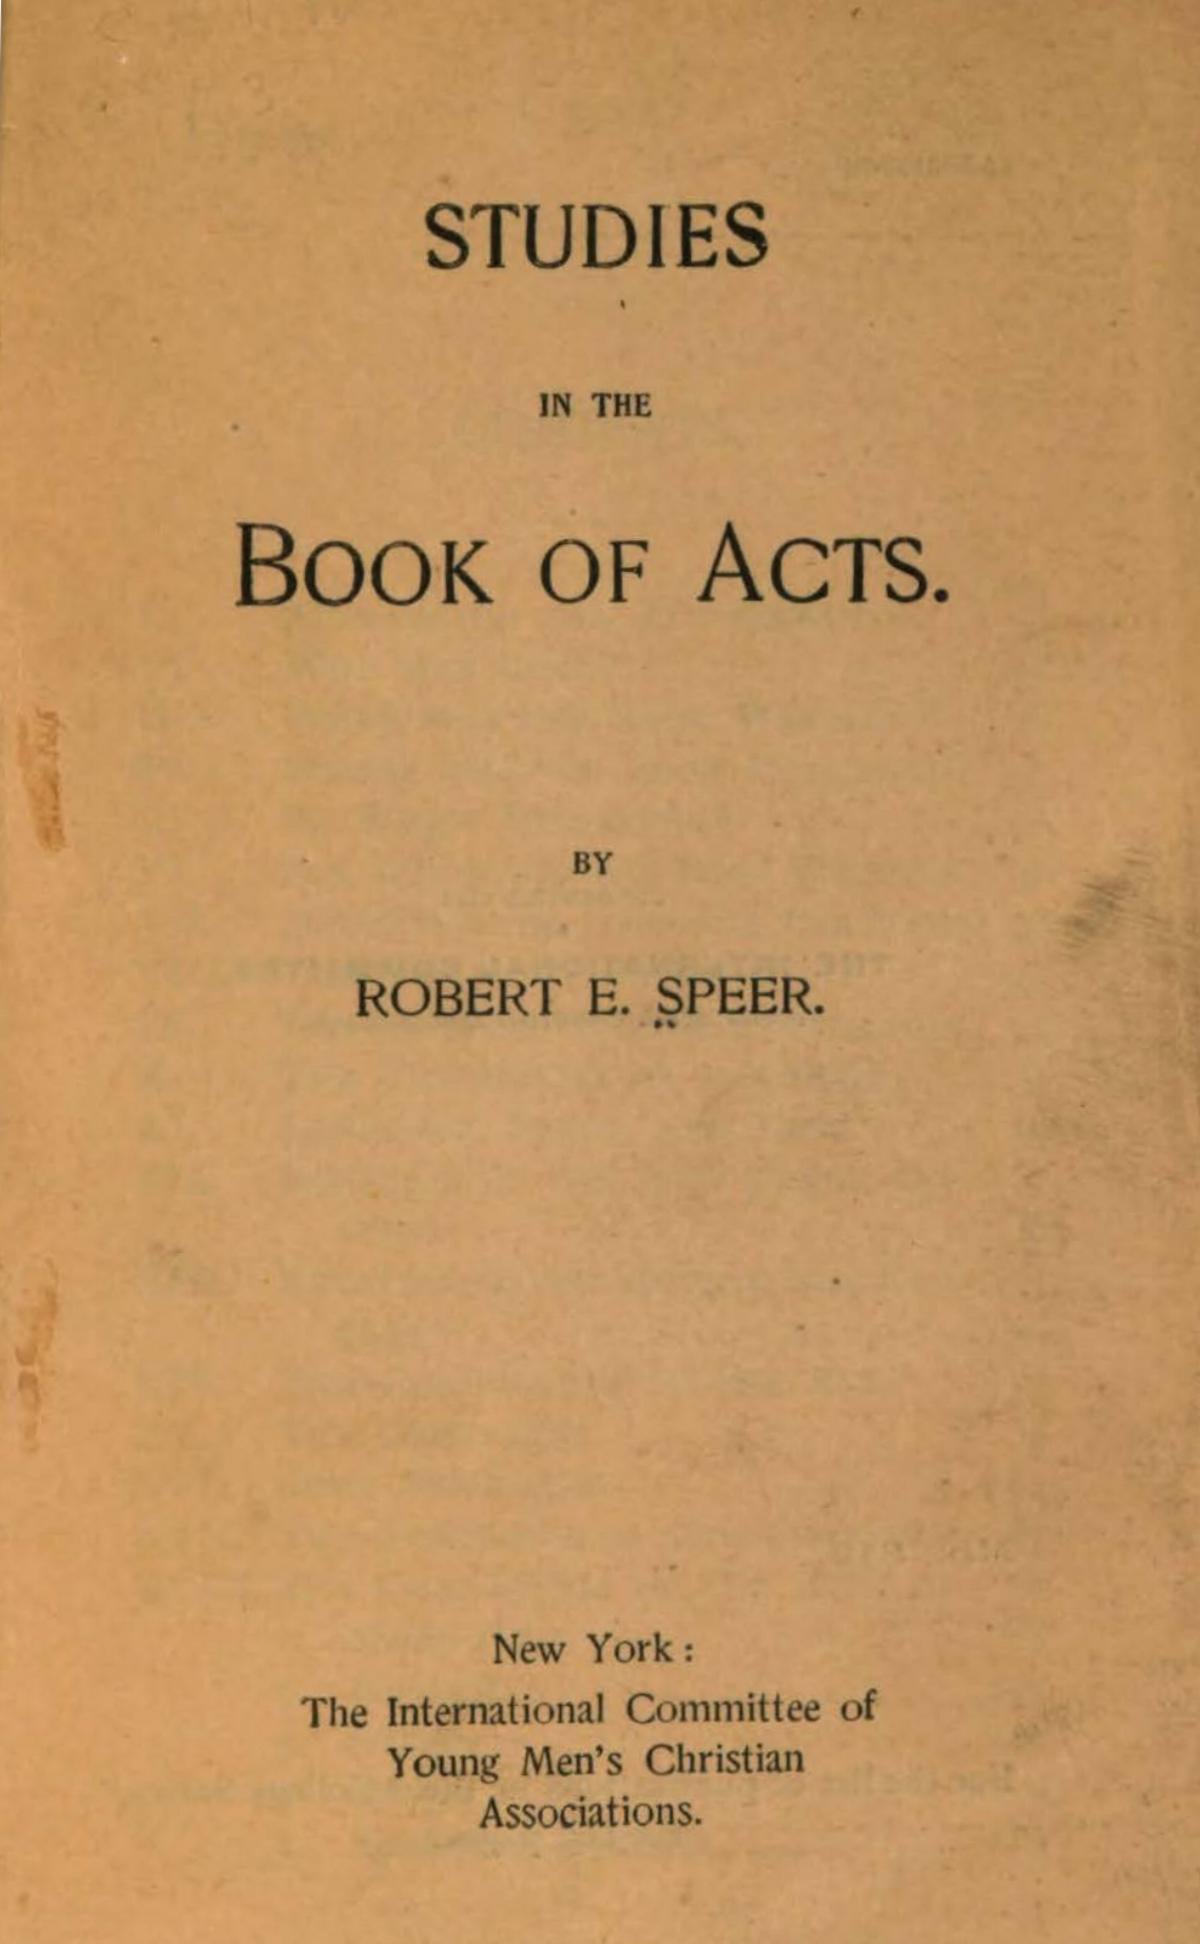 Speer, Robert Elliott, Studies in the Book of Acts Title Page.jpg